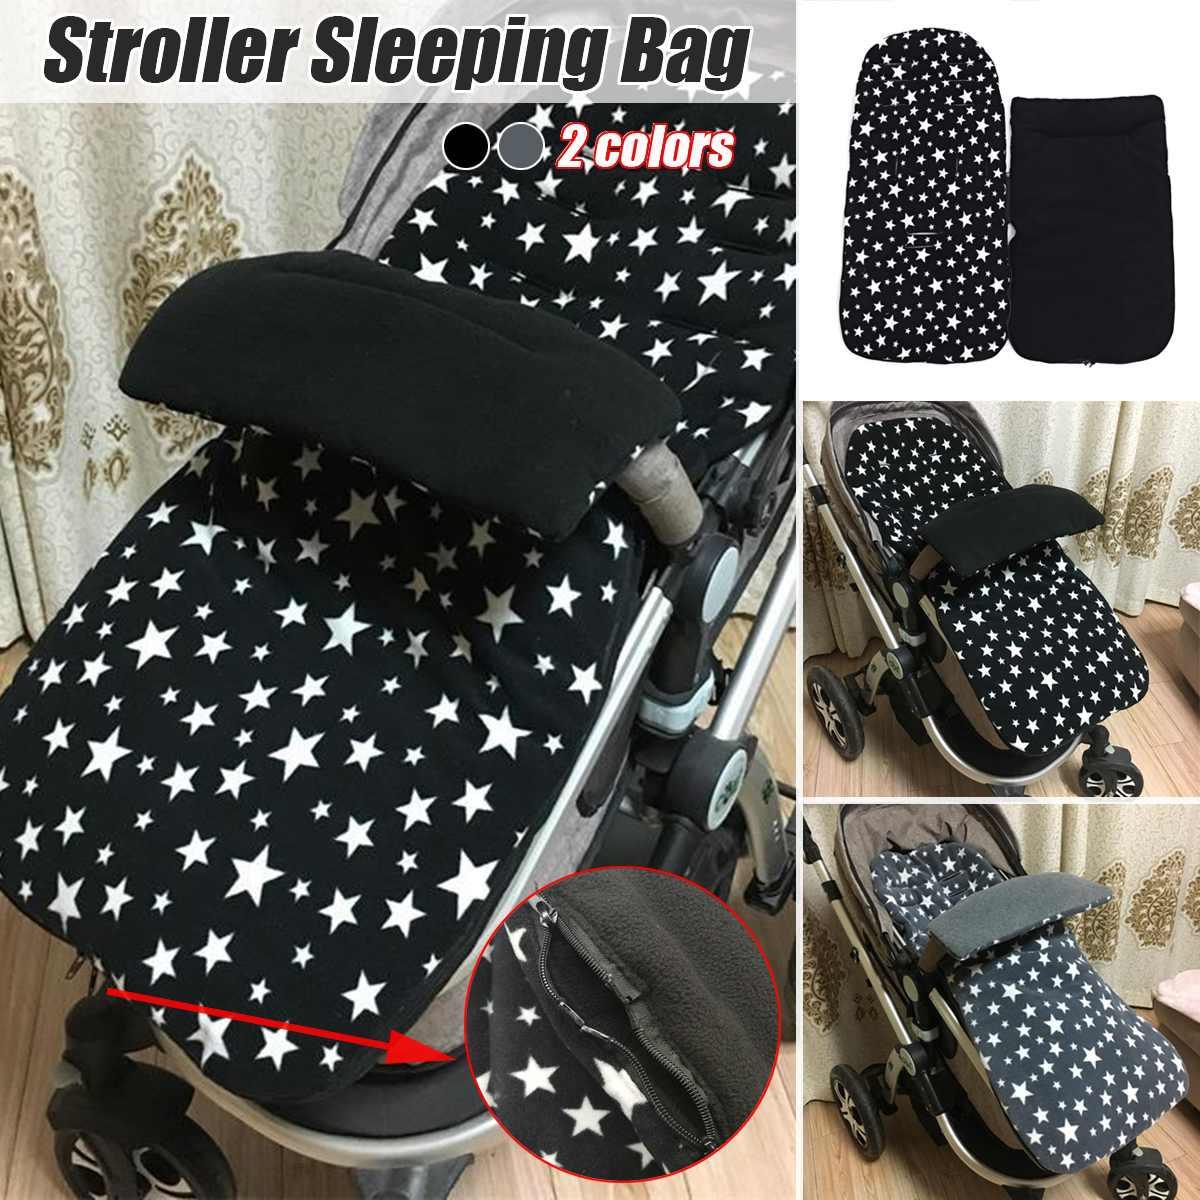 Universal Baby Toddler Winter Stroller Thick Star Polar Fleece Sleeping Bag Keep Warm Newborn Envelope Diaper In Stroller